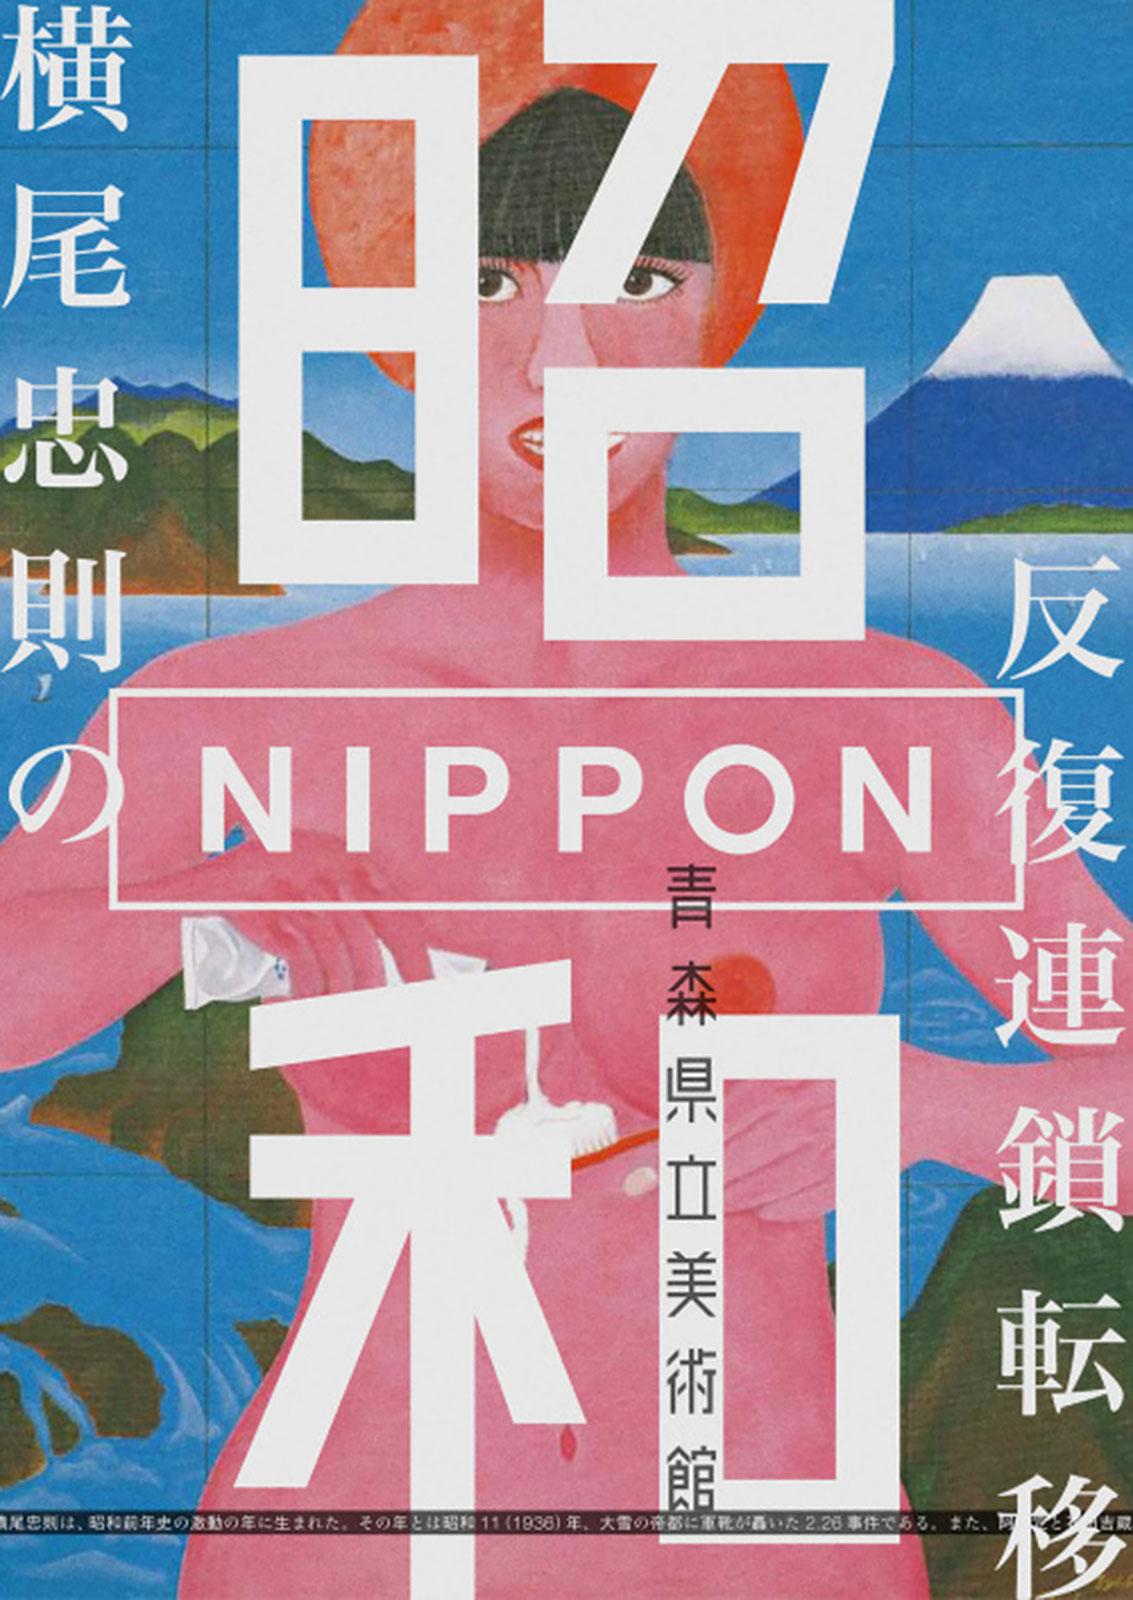 one-more-good-one-tadanori-yokoo-designer-artist-illustrator-japanese